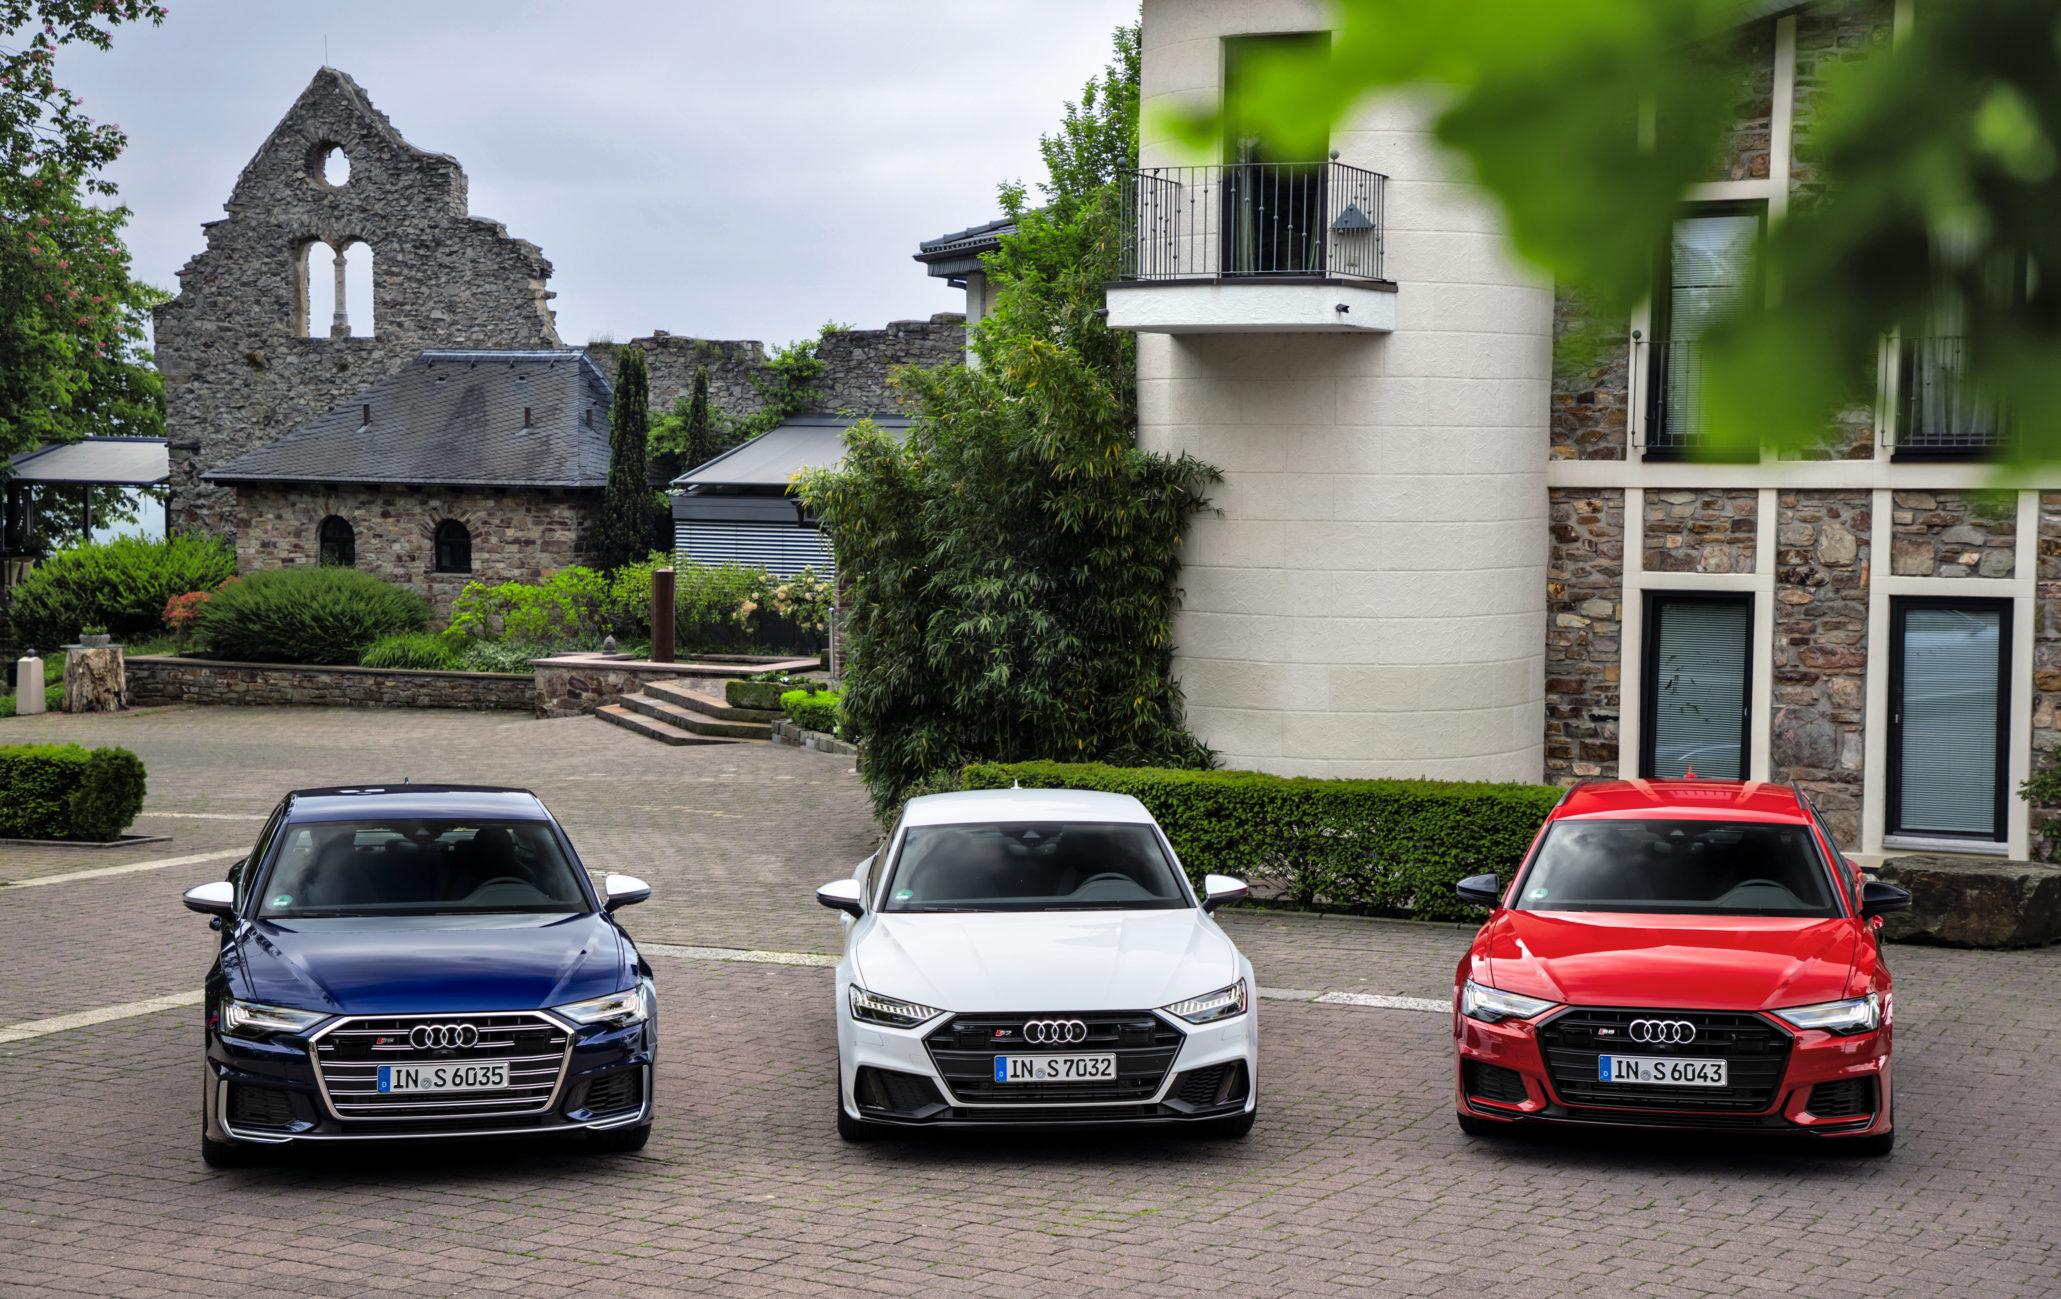 Audi S6, Audi S7 Sportback, Audi S6 Avant